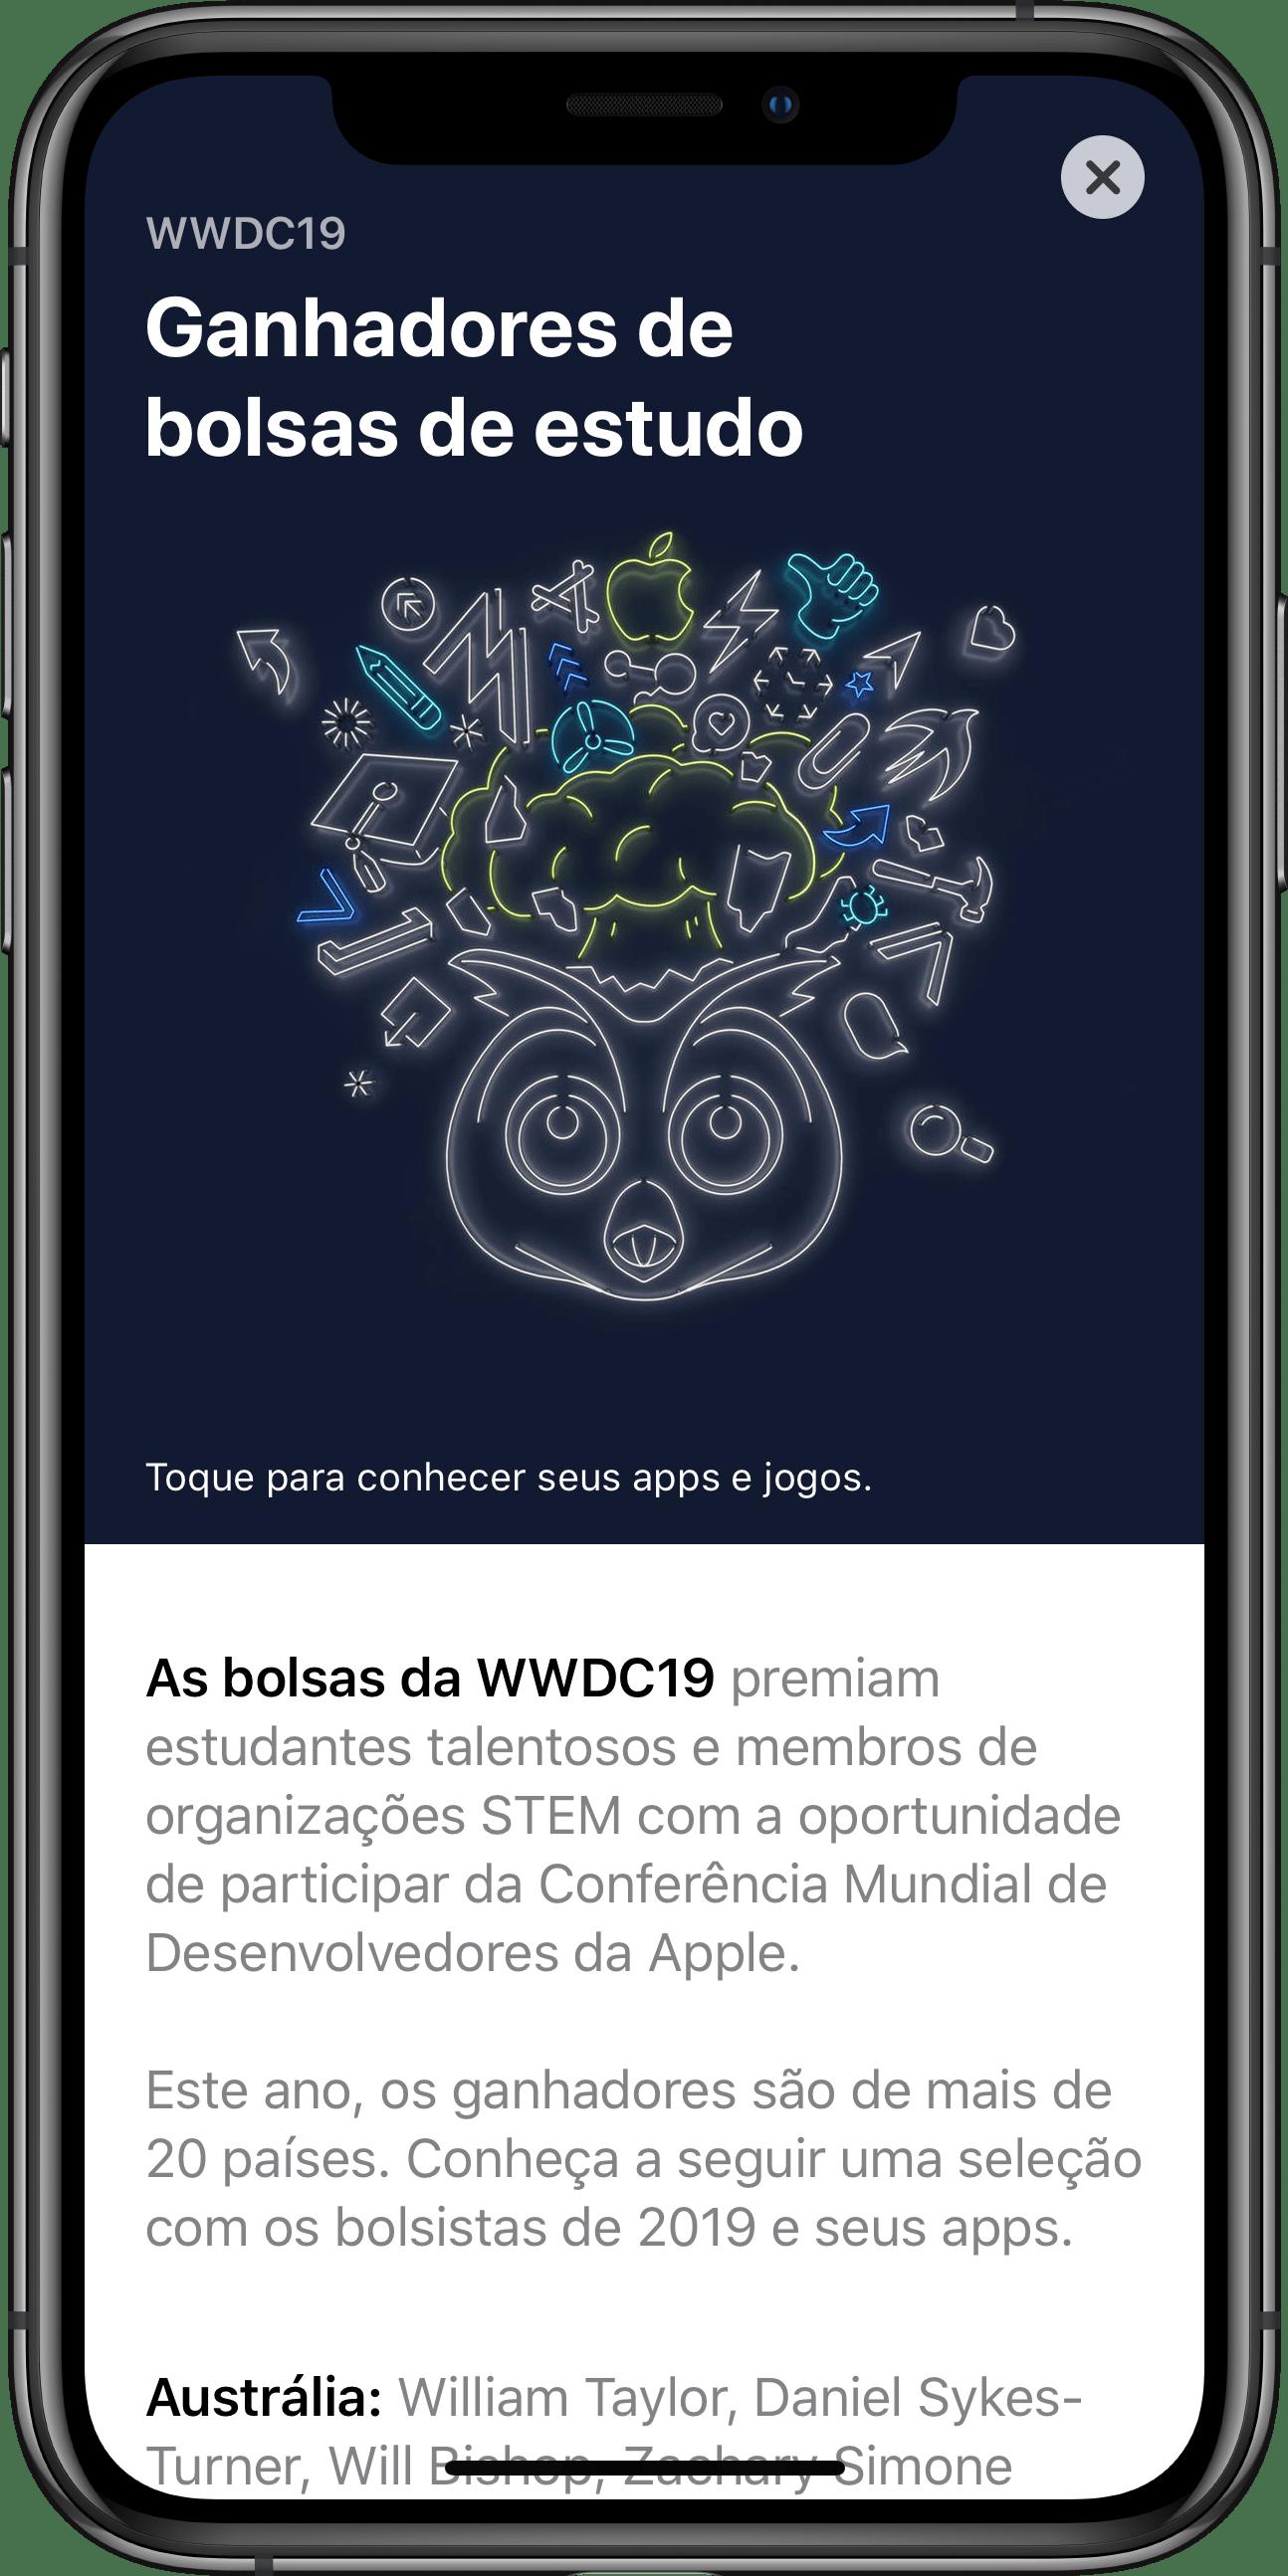 WWDC19 Student Apps